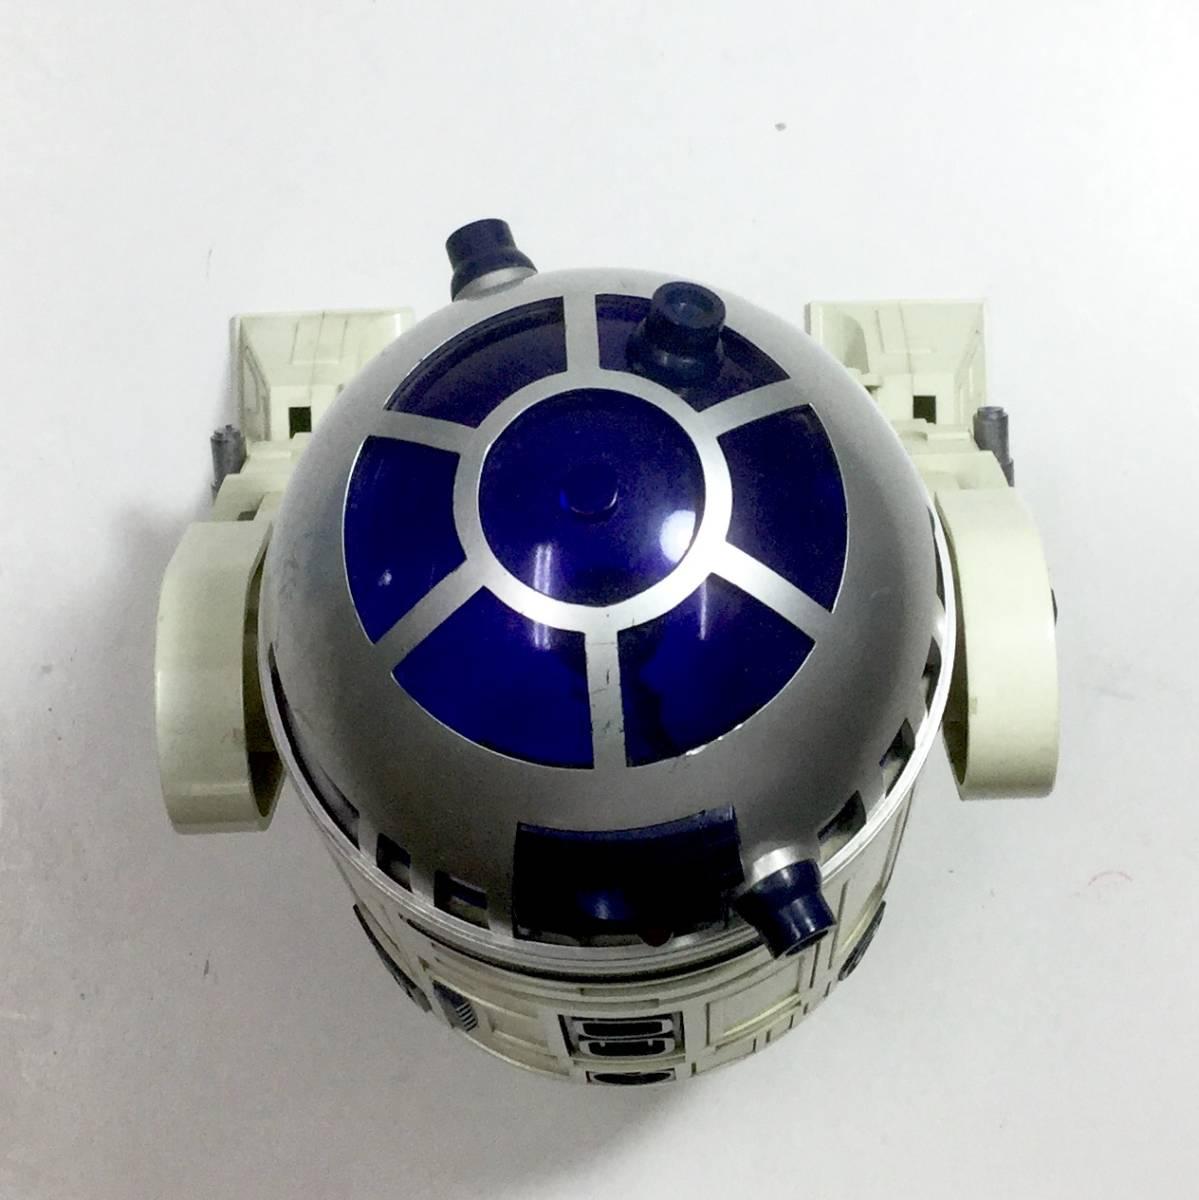 R2-D2 ラジオ 作動品 スターウォーズ 1977年版 コカコーラ 懸賞品 非売品 レトロ ビンテージ _画像6